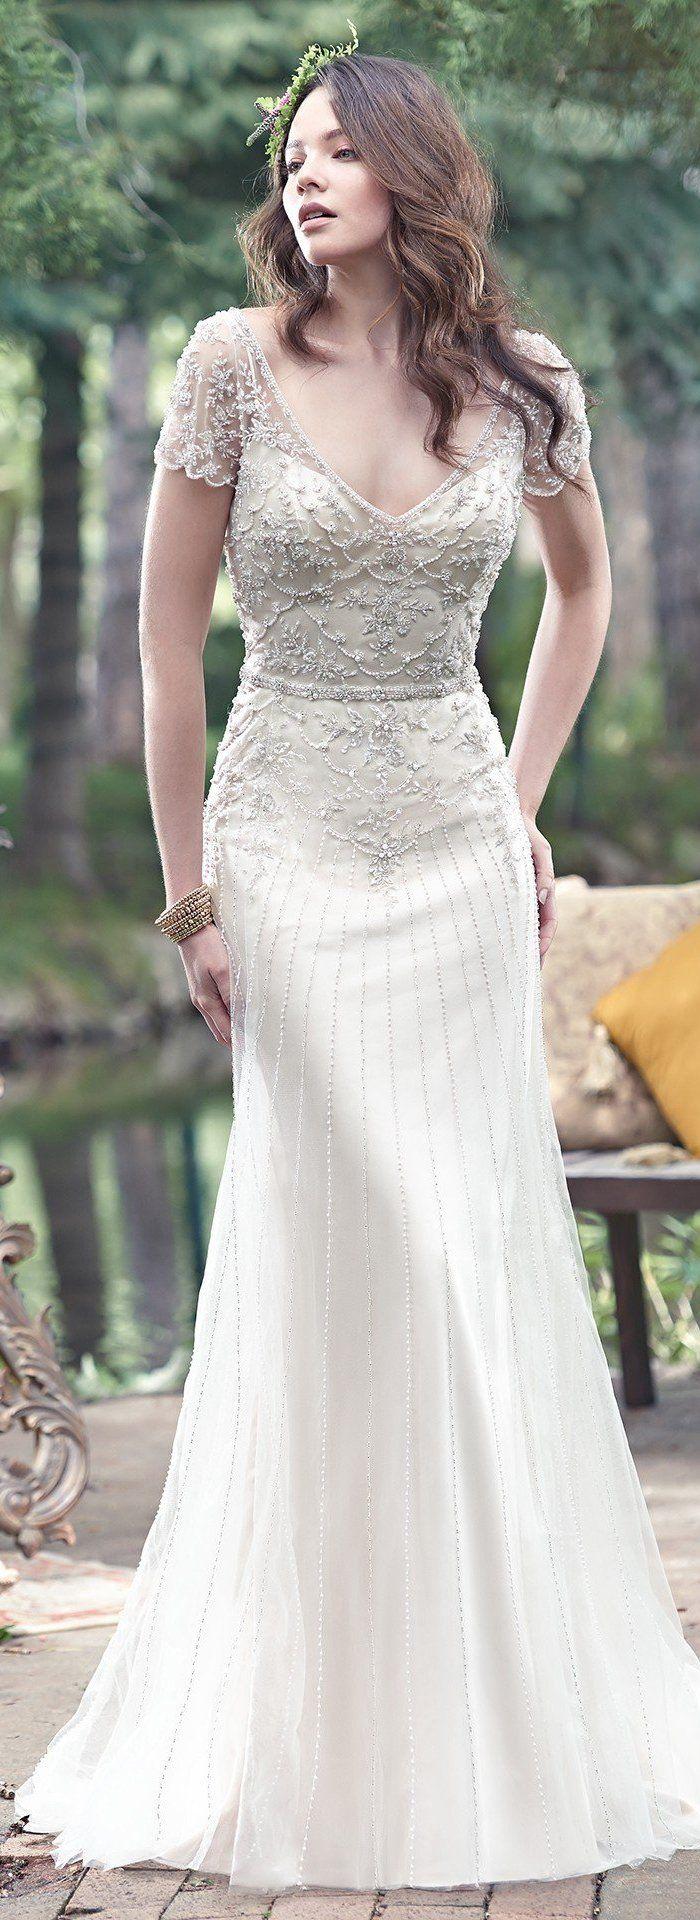 Vintage Wedding Gowns With Geometric Details Amal Dress By Maggie Sottero Vintageweddingdress